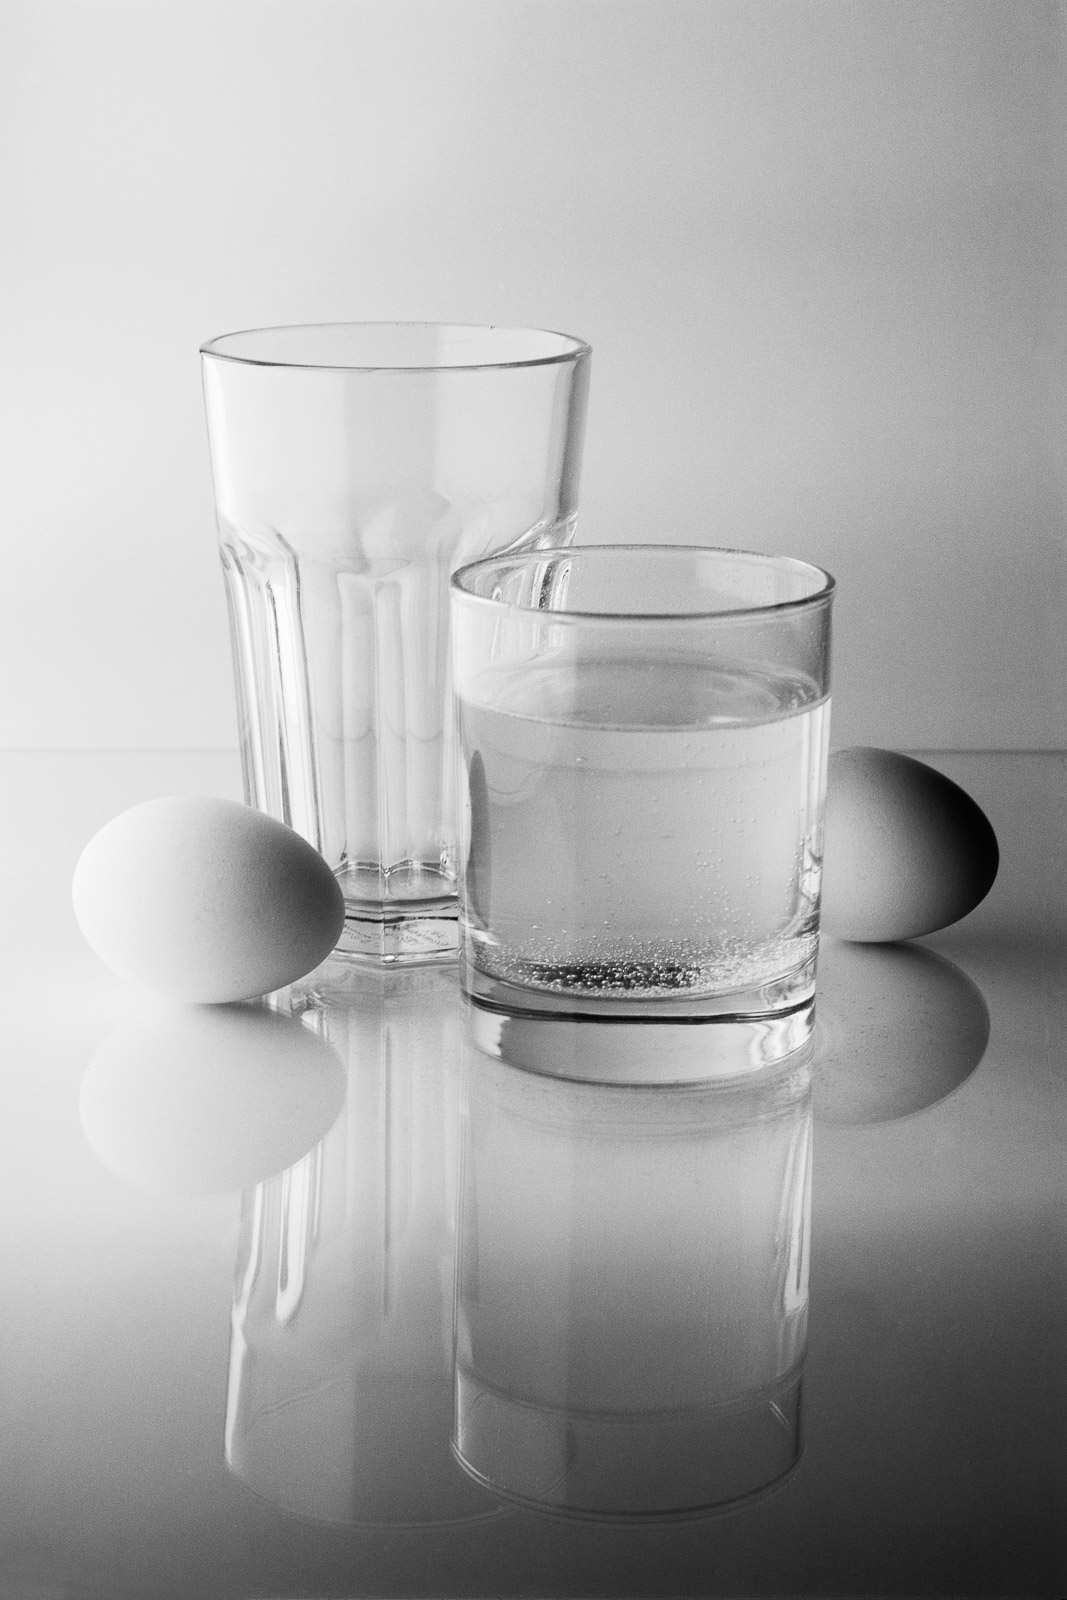 Still life with eggs - homage to Josef Sudek